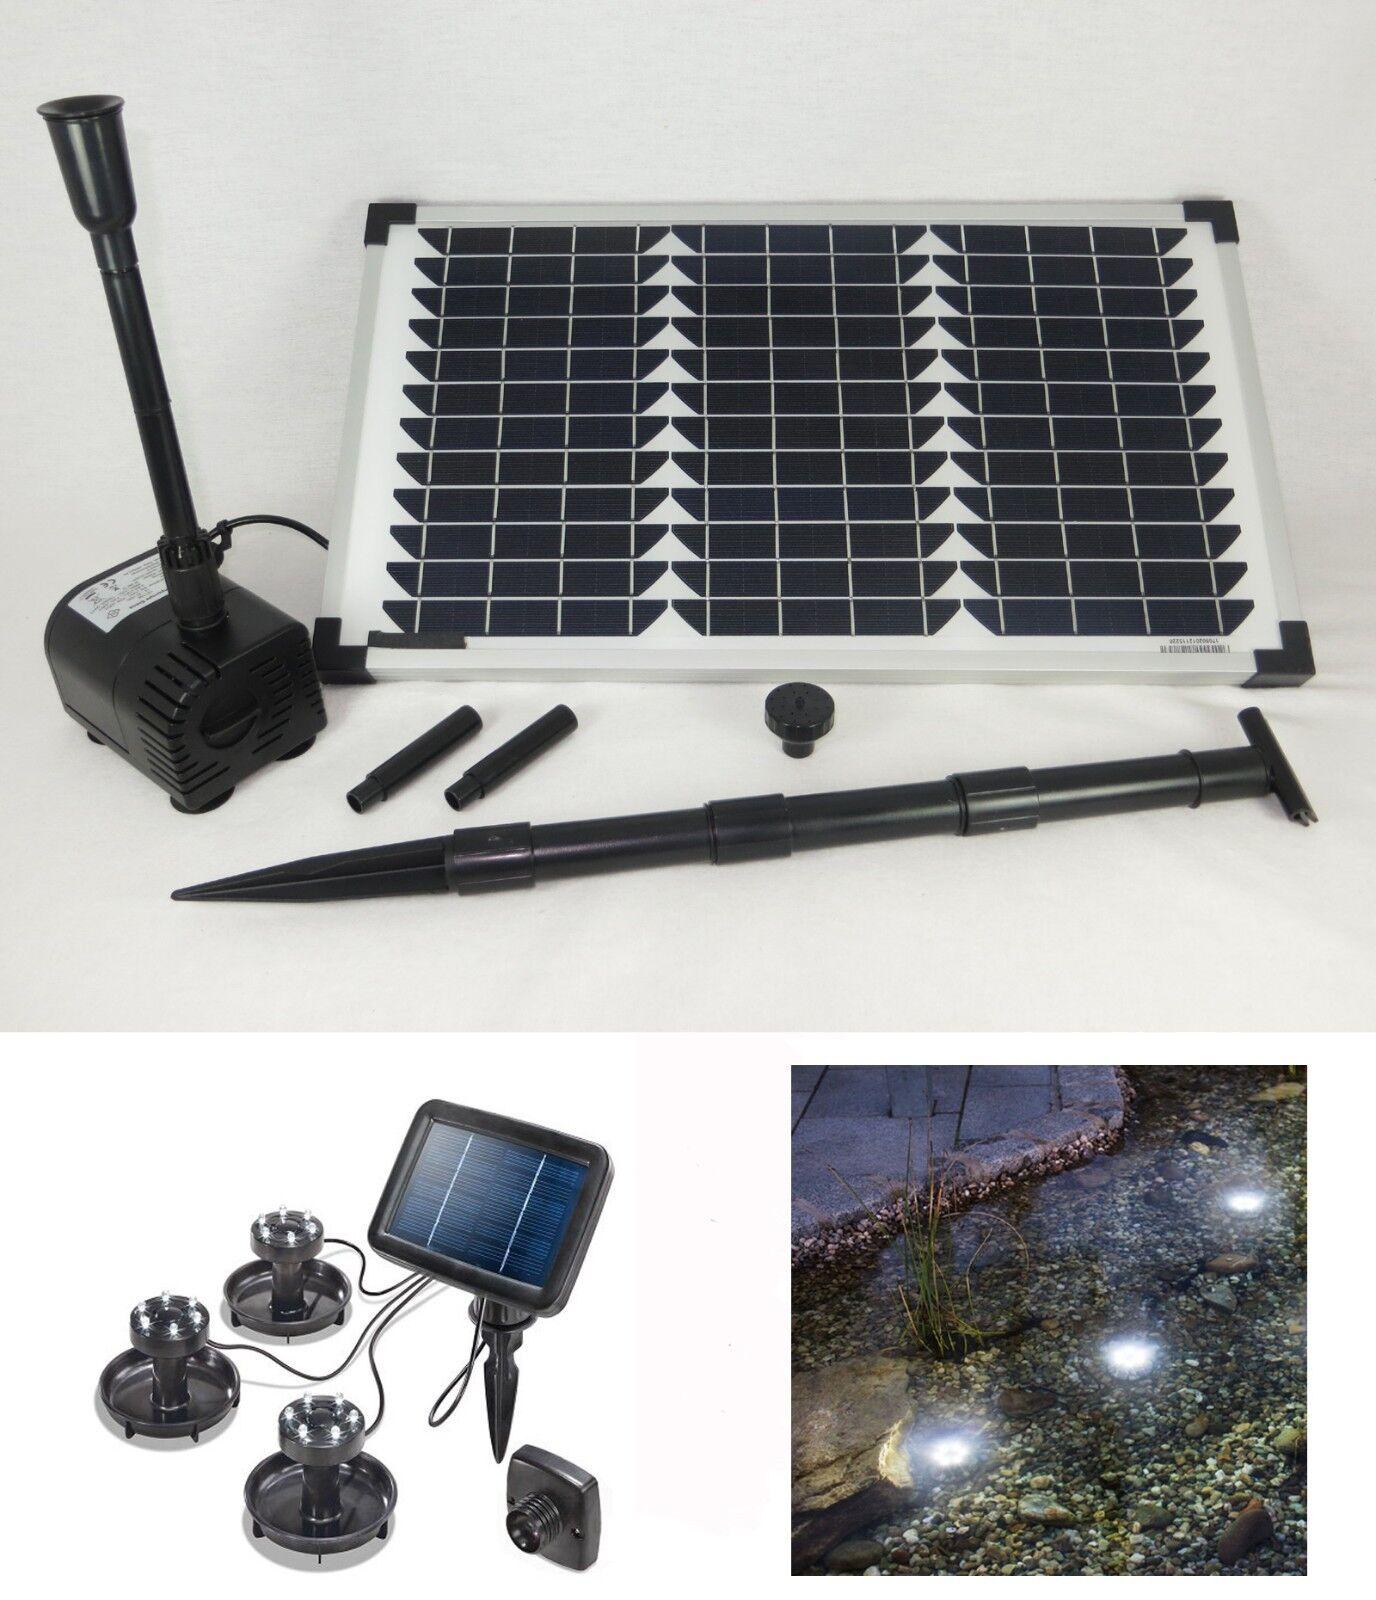 20 W estanque solar bomba Tauch + iluminación LED jardín emisor estanque pumpenset